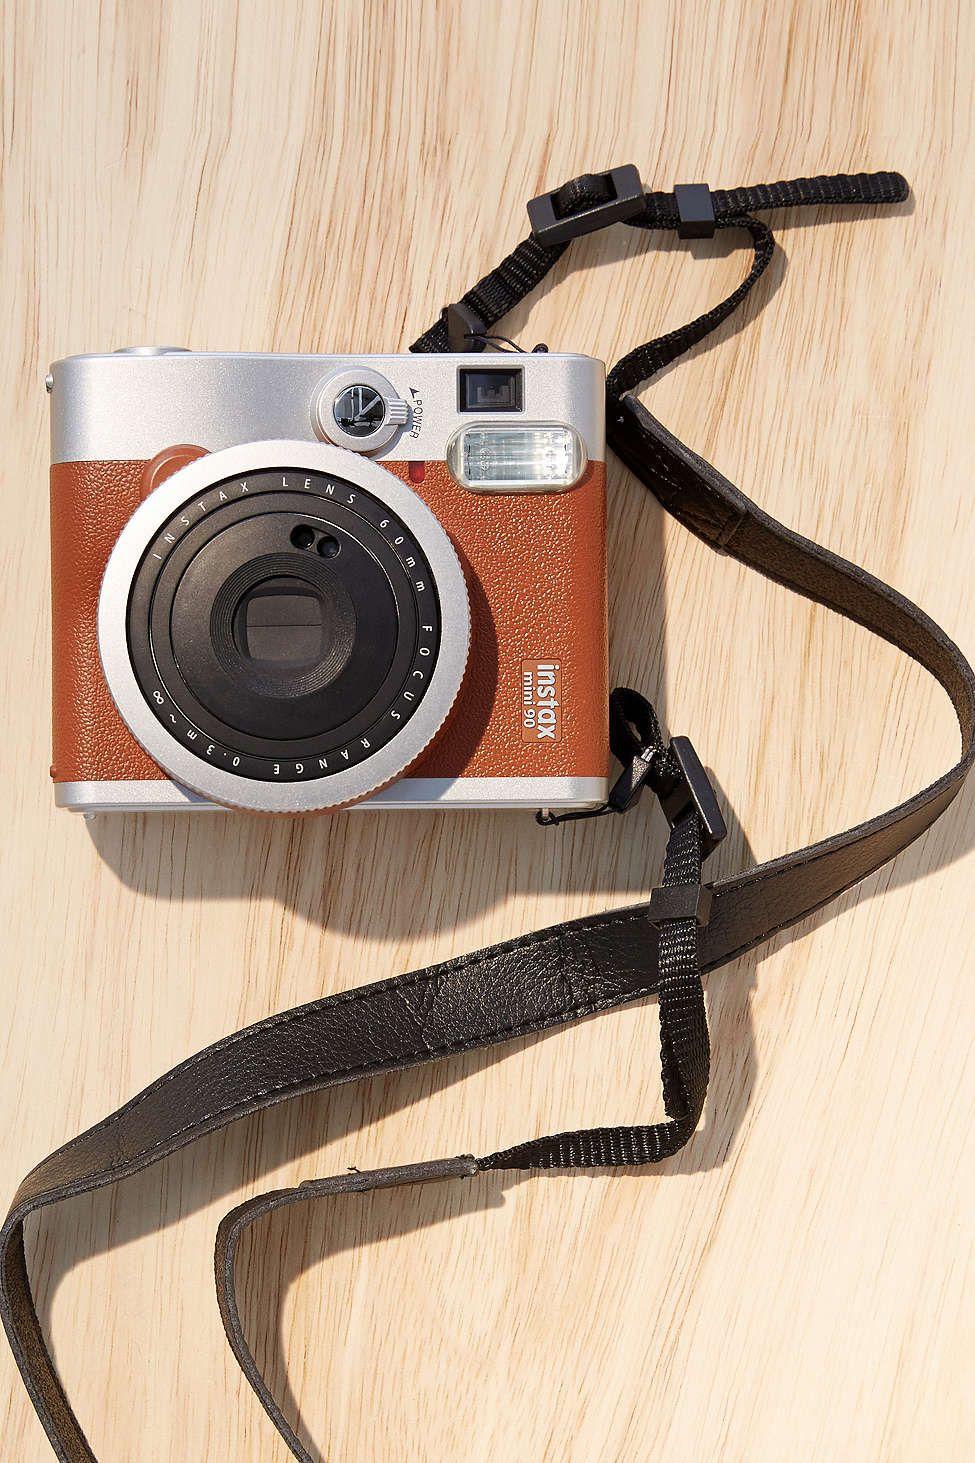 Fujifilm Instax Mini 90 Neo Classic Camera Fujifilm Instax Mini 90 Instax Mini 90 Instax Mini